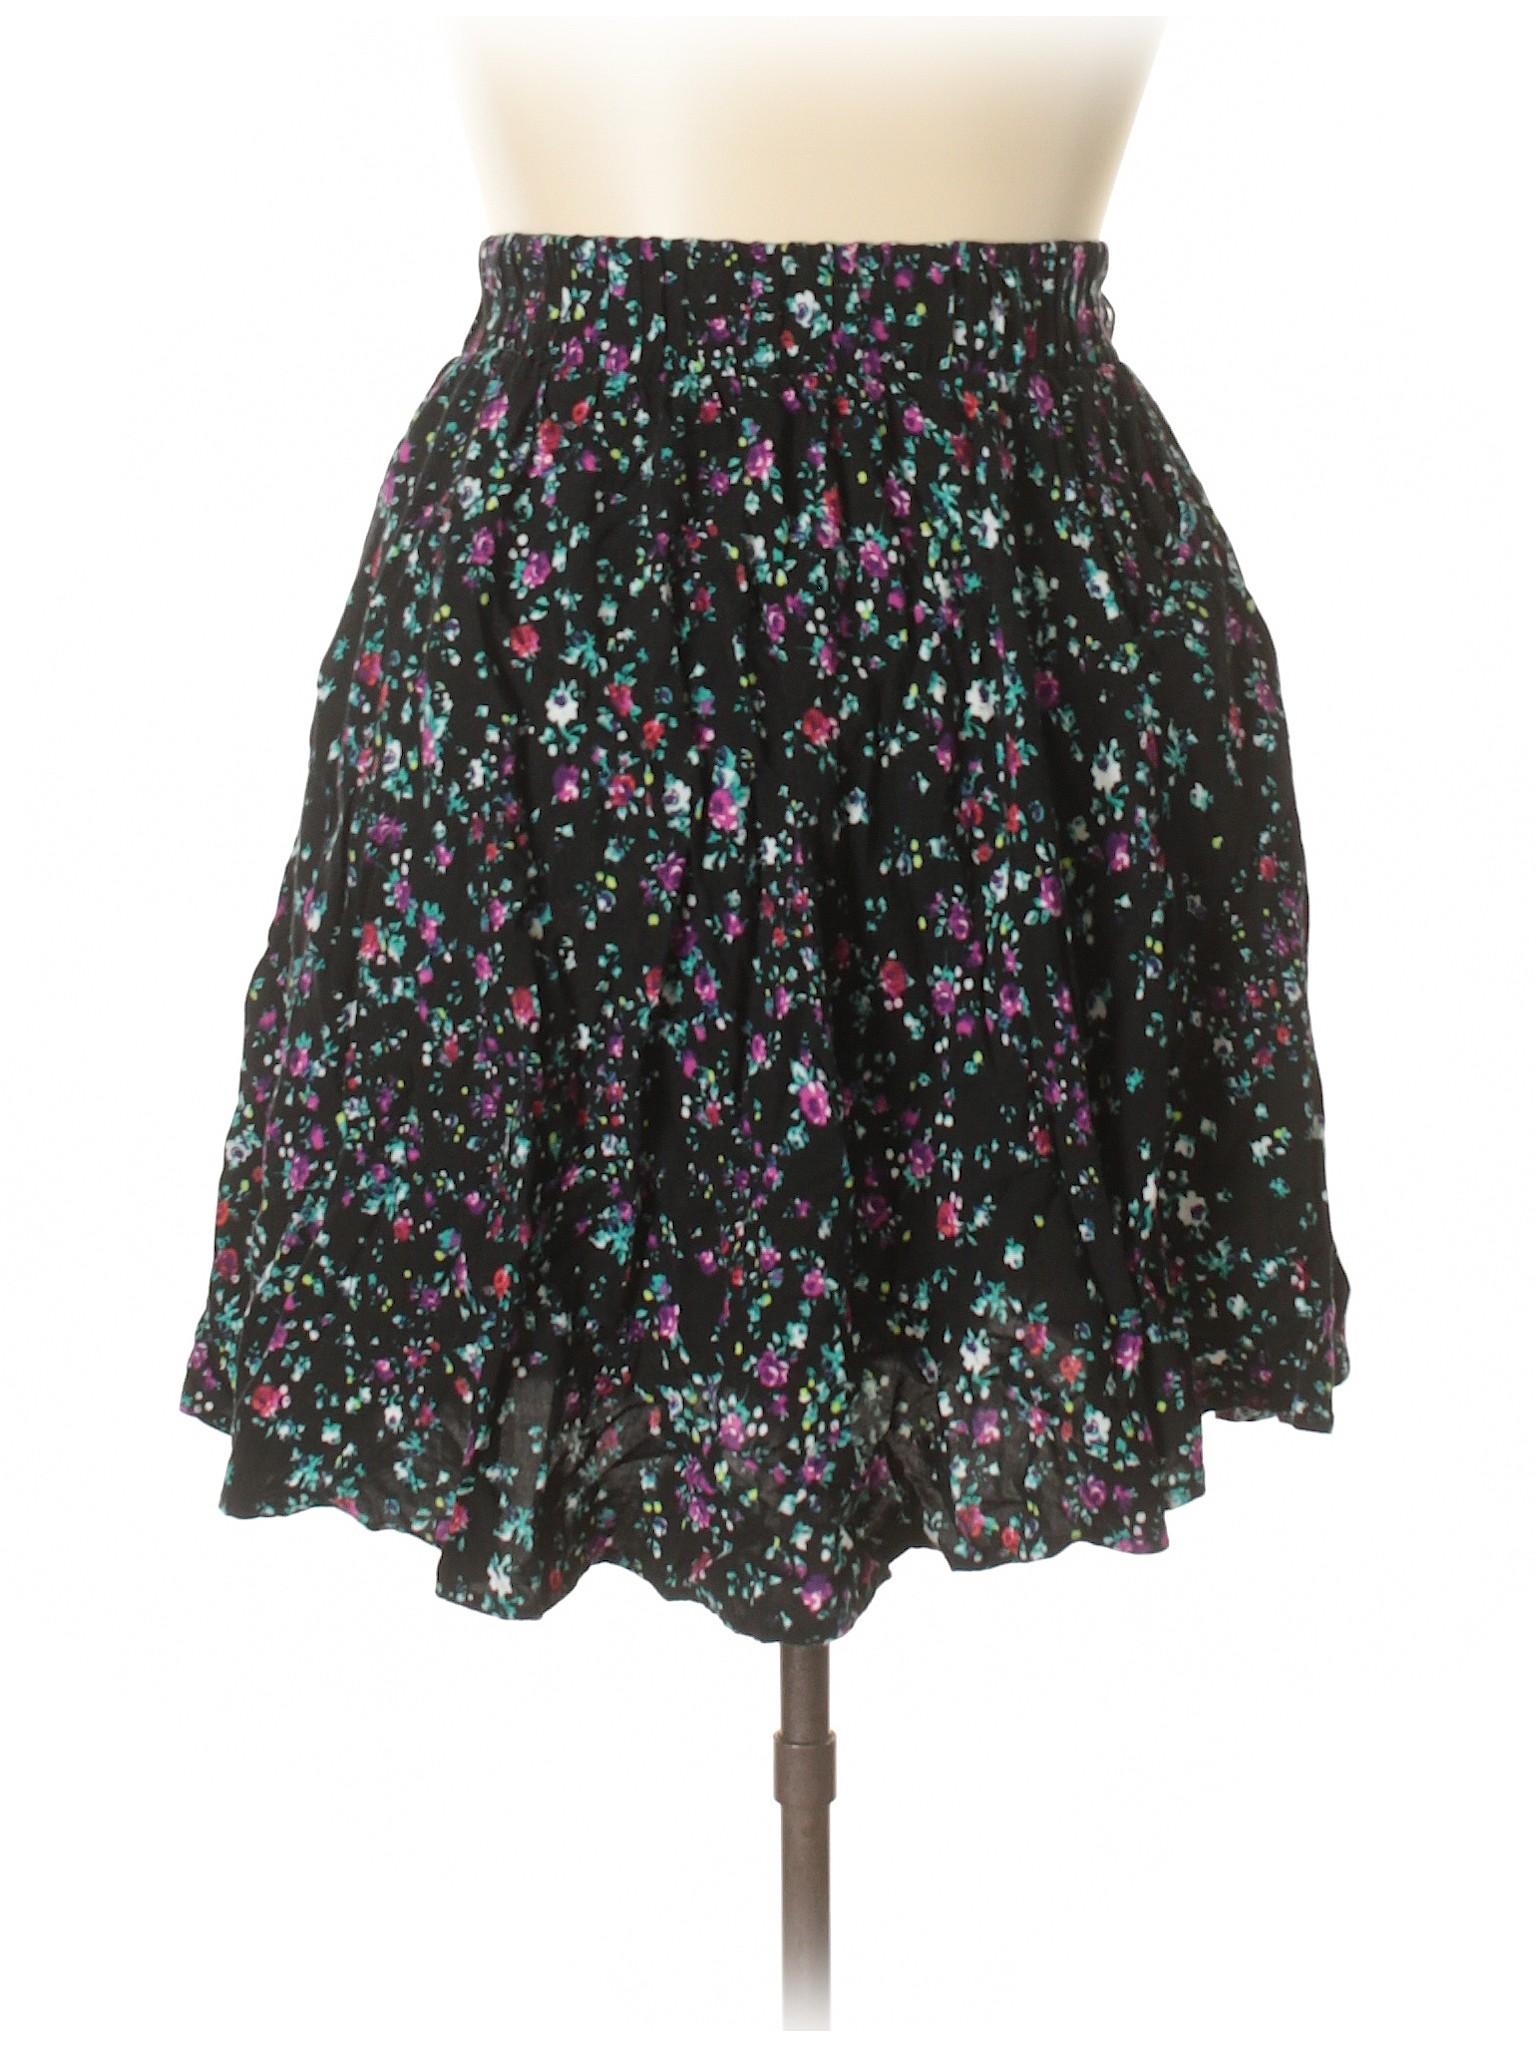 Casual Boutique Boutique Casual Skirt Boutique Boutique Boutique Boutique Casual Skirt Skirt Casual Skirt Skirt Casual Skirt Casual Boutique wqAnpCI